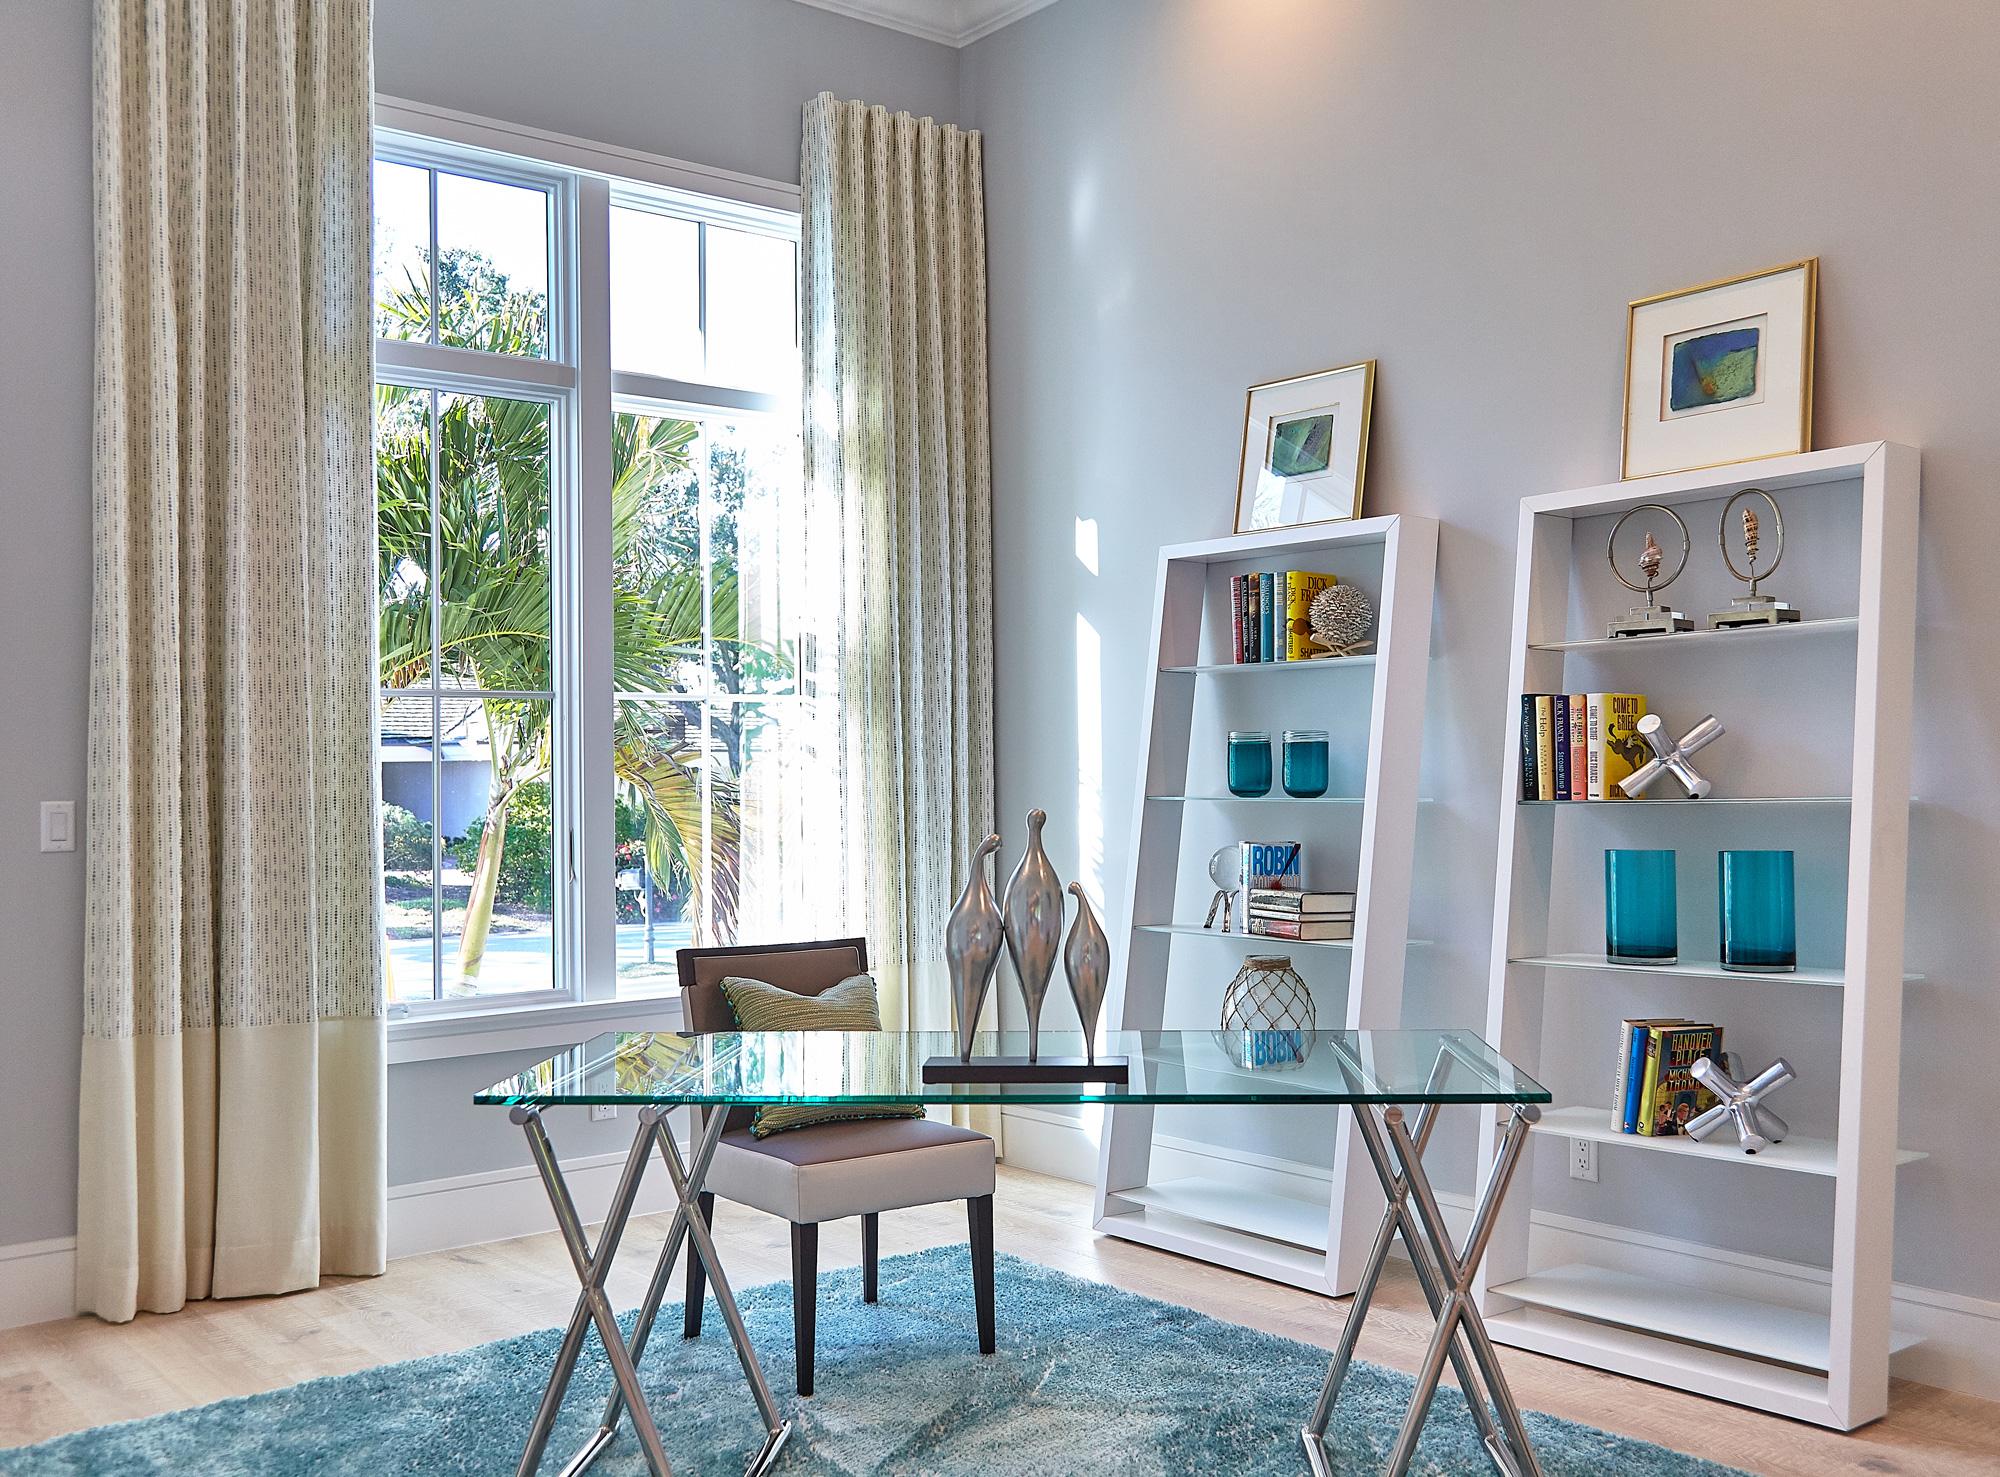 By: Linda Serre, Interior Designer At Robb U0026 Stucky